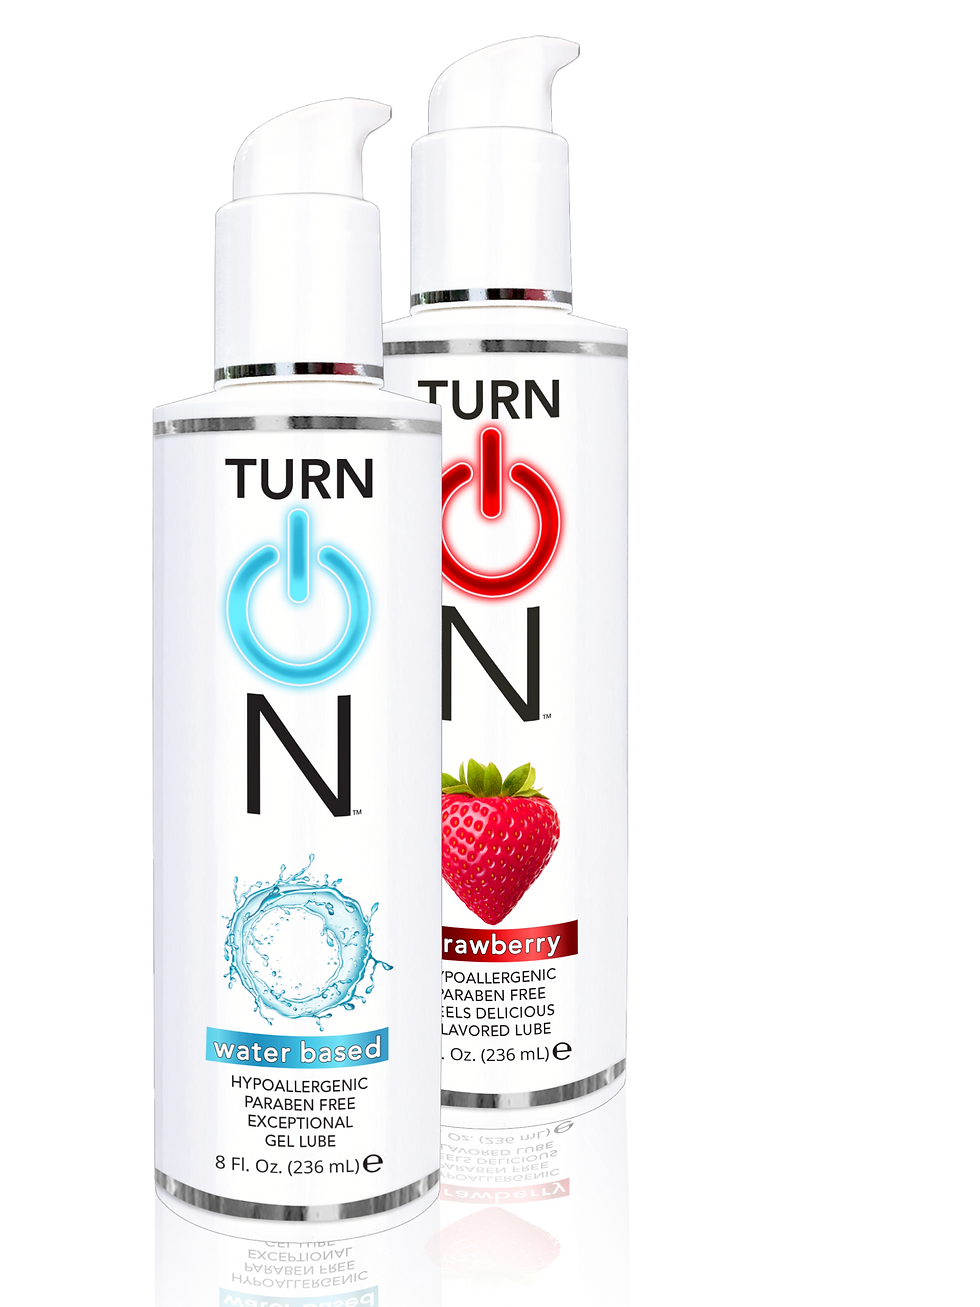 TurnOn bottle of sex lube